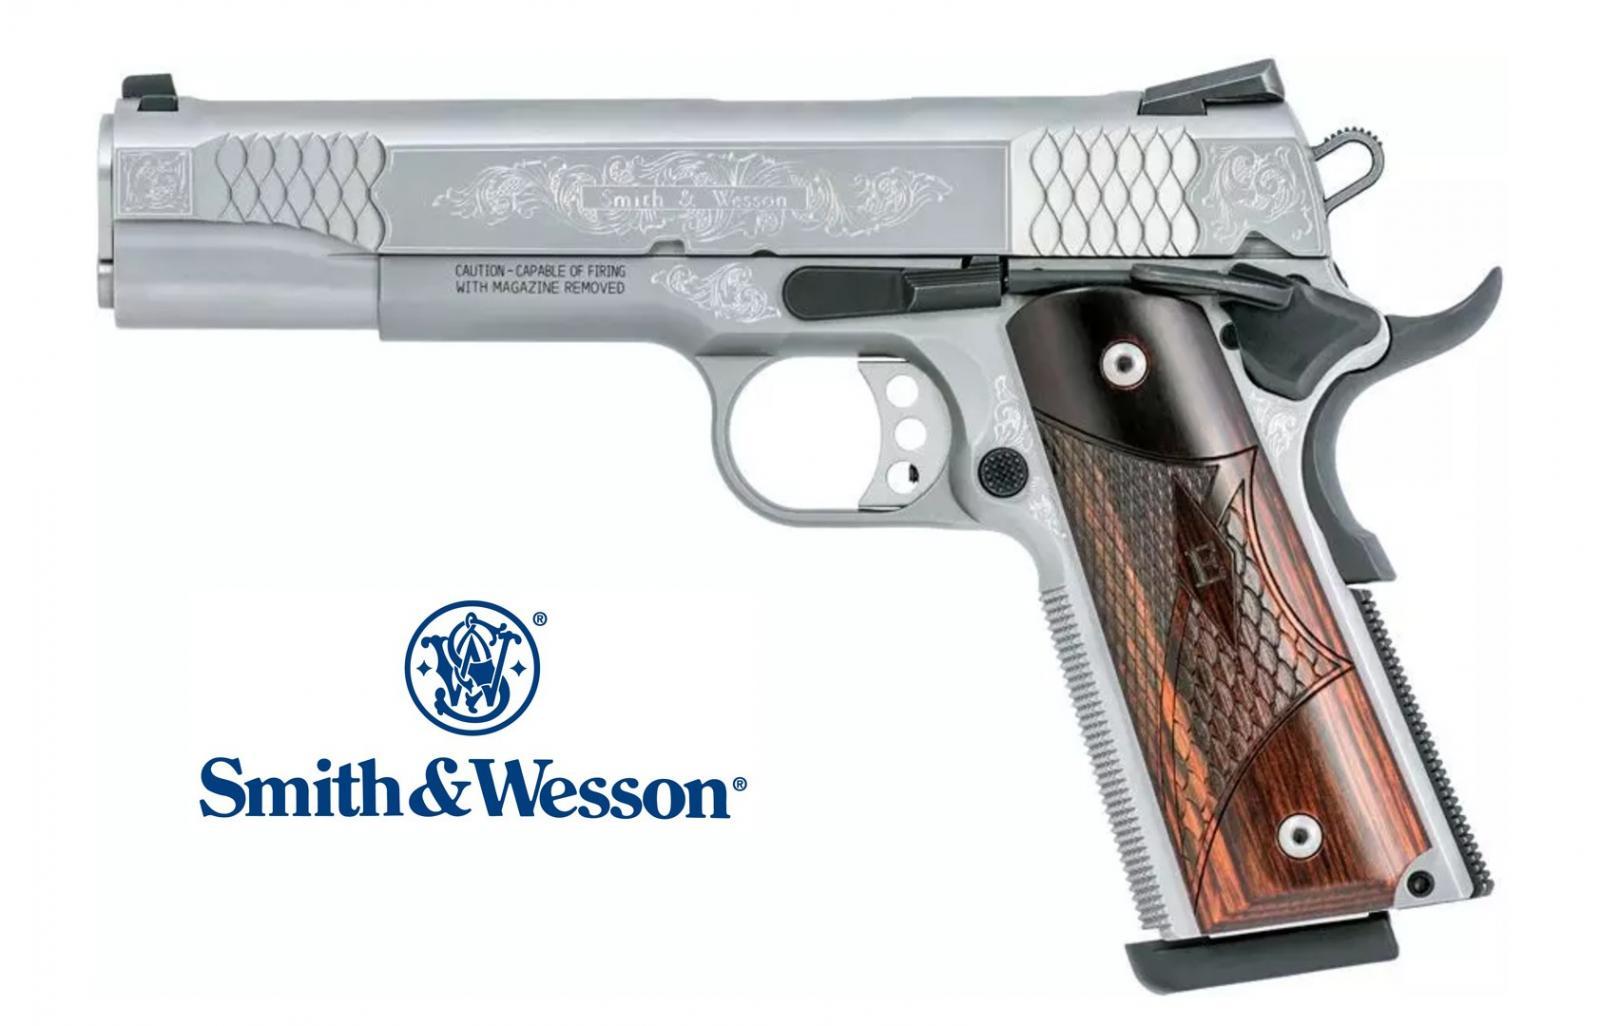 Pistolet SMITH & WESSON 1911 E-SERIE GRAVÉ Cal 45ACP